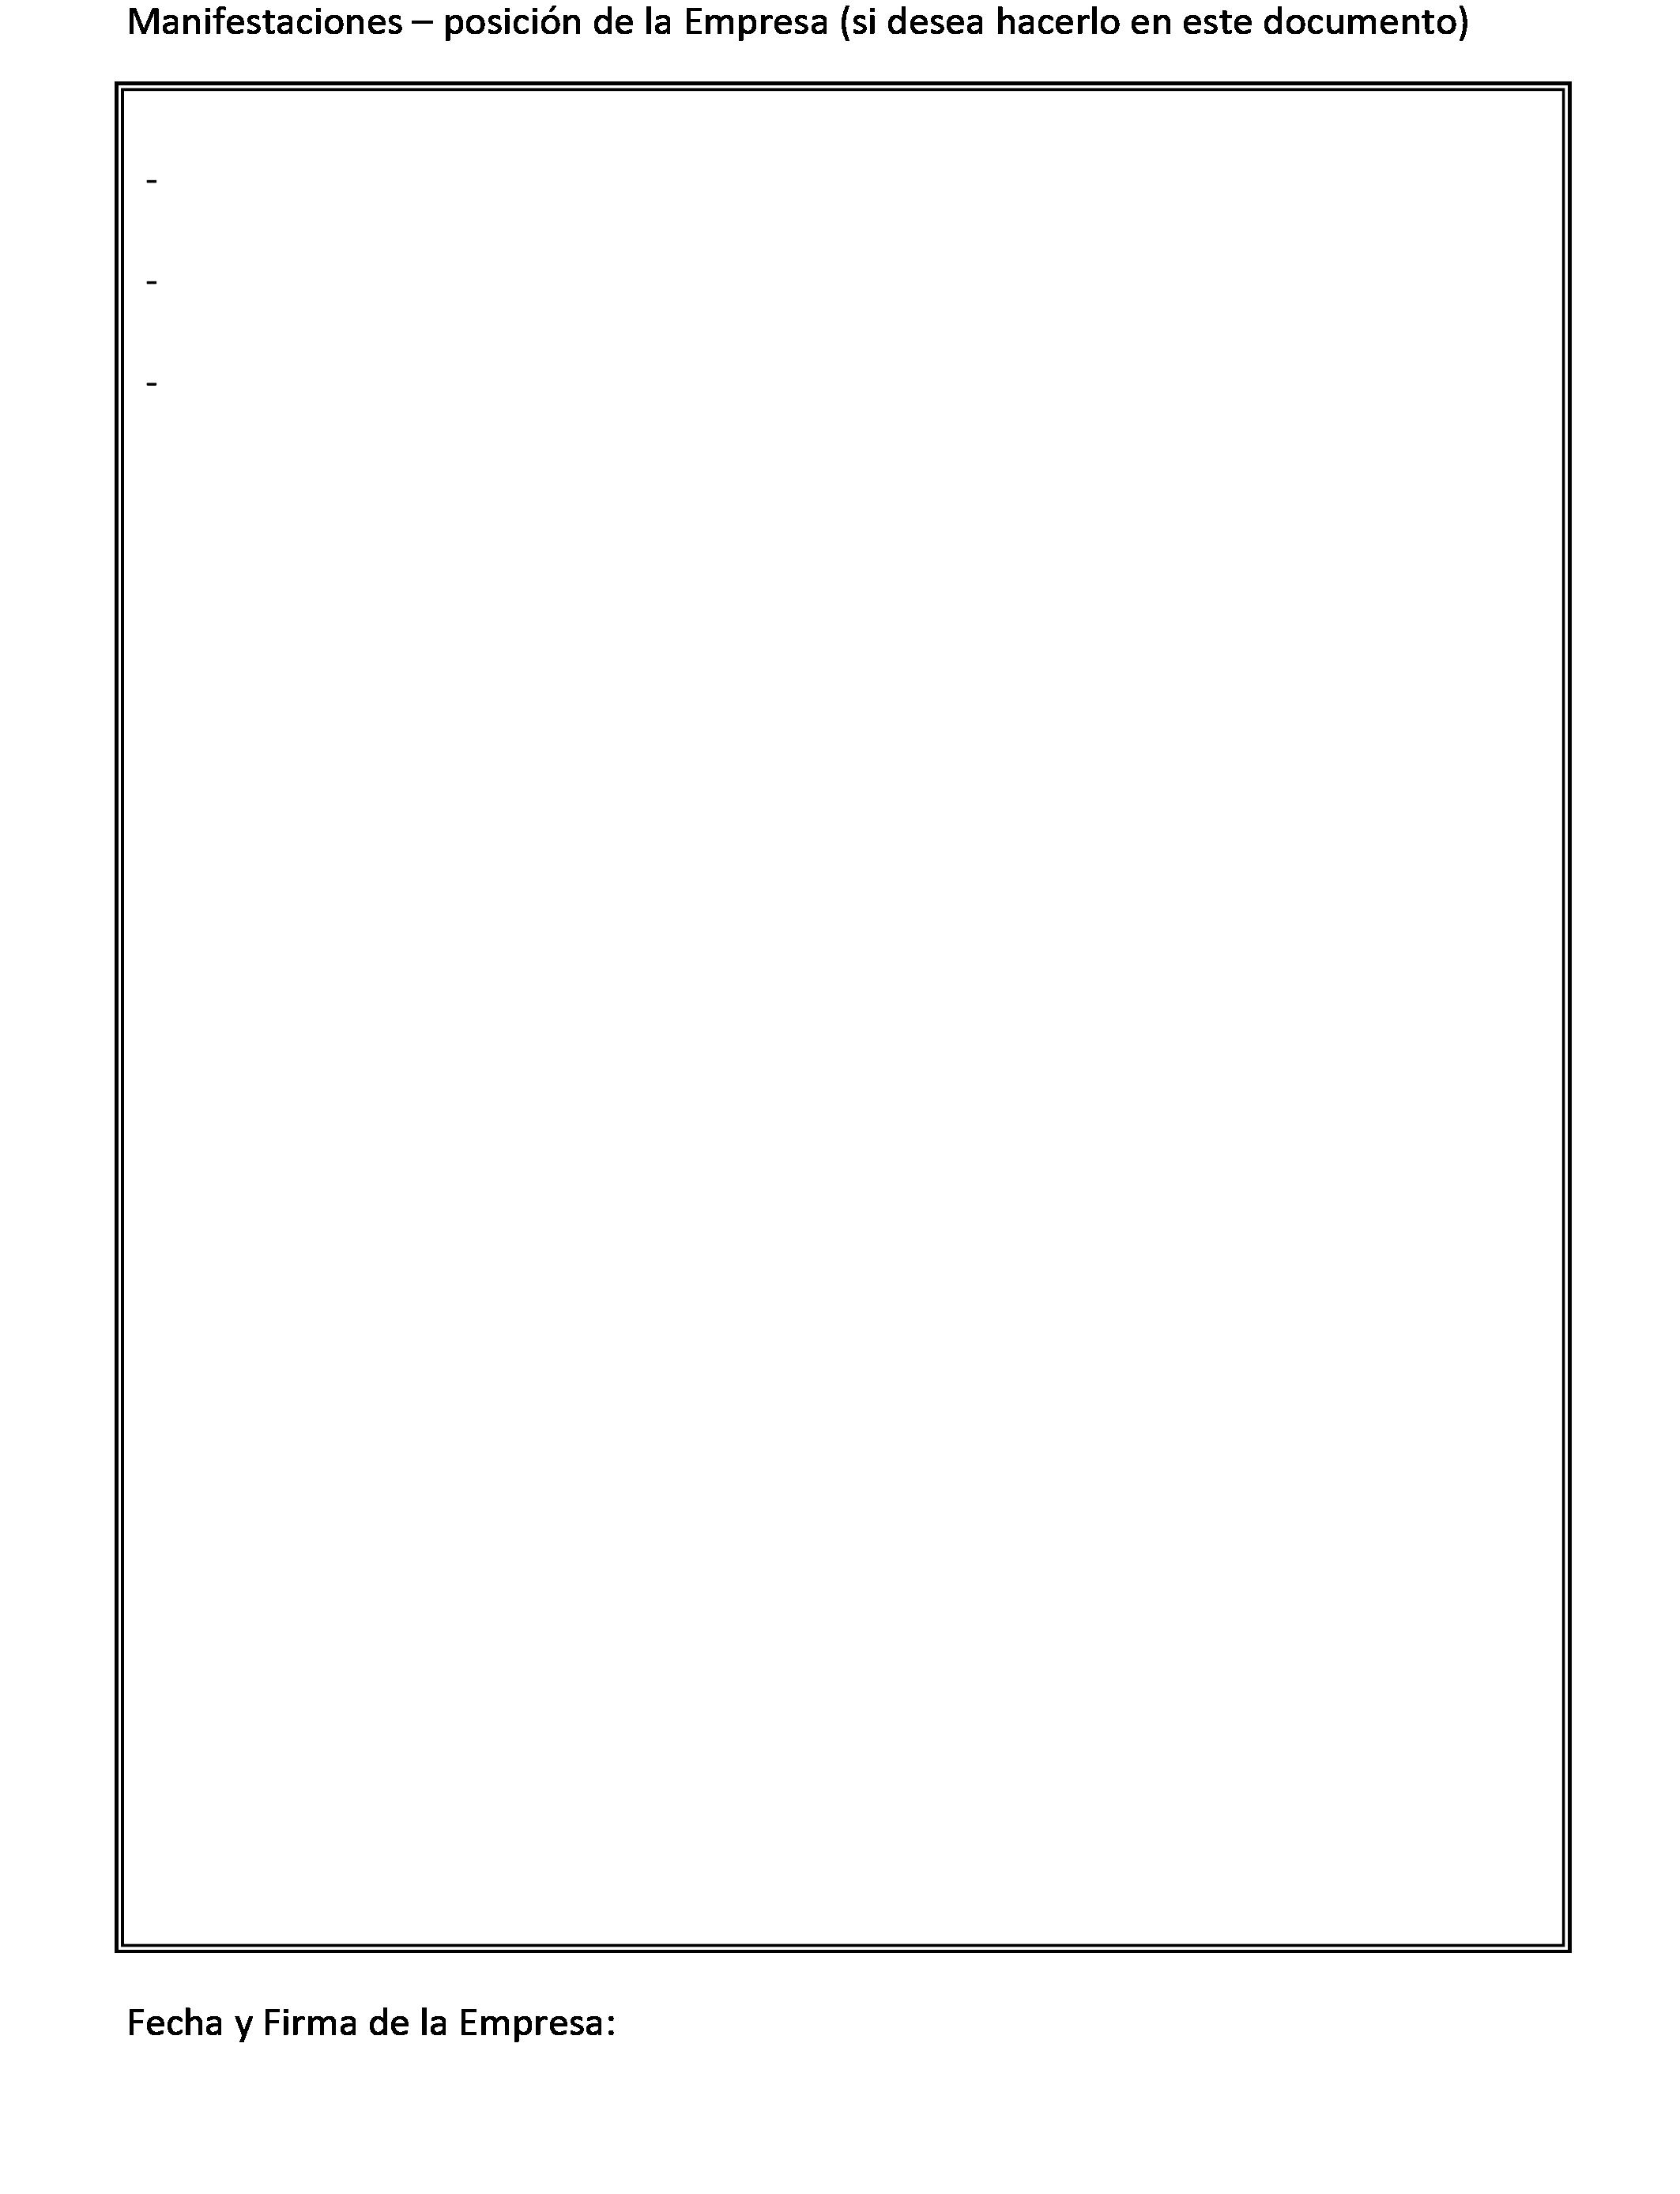 BOE.es - Documento BOE-A-2016-468